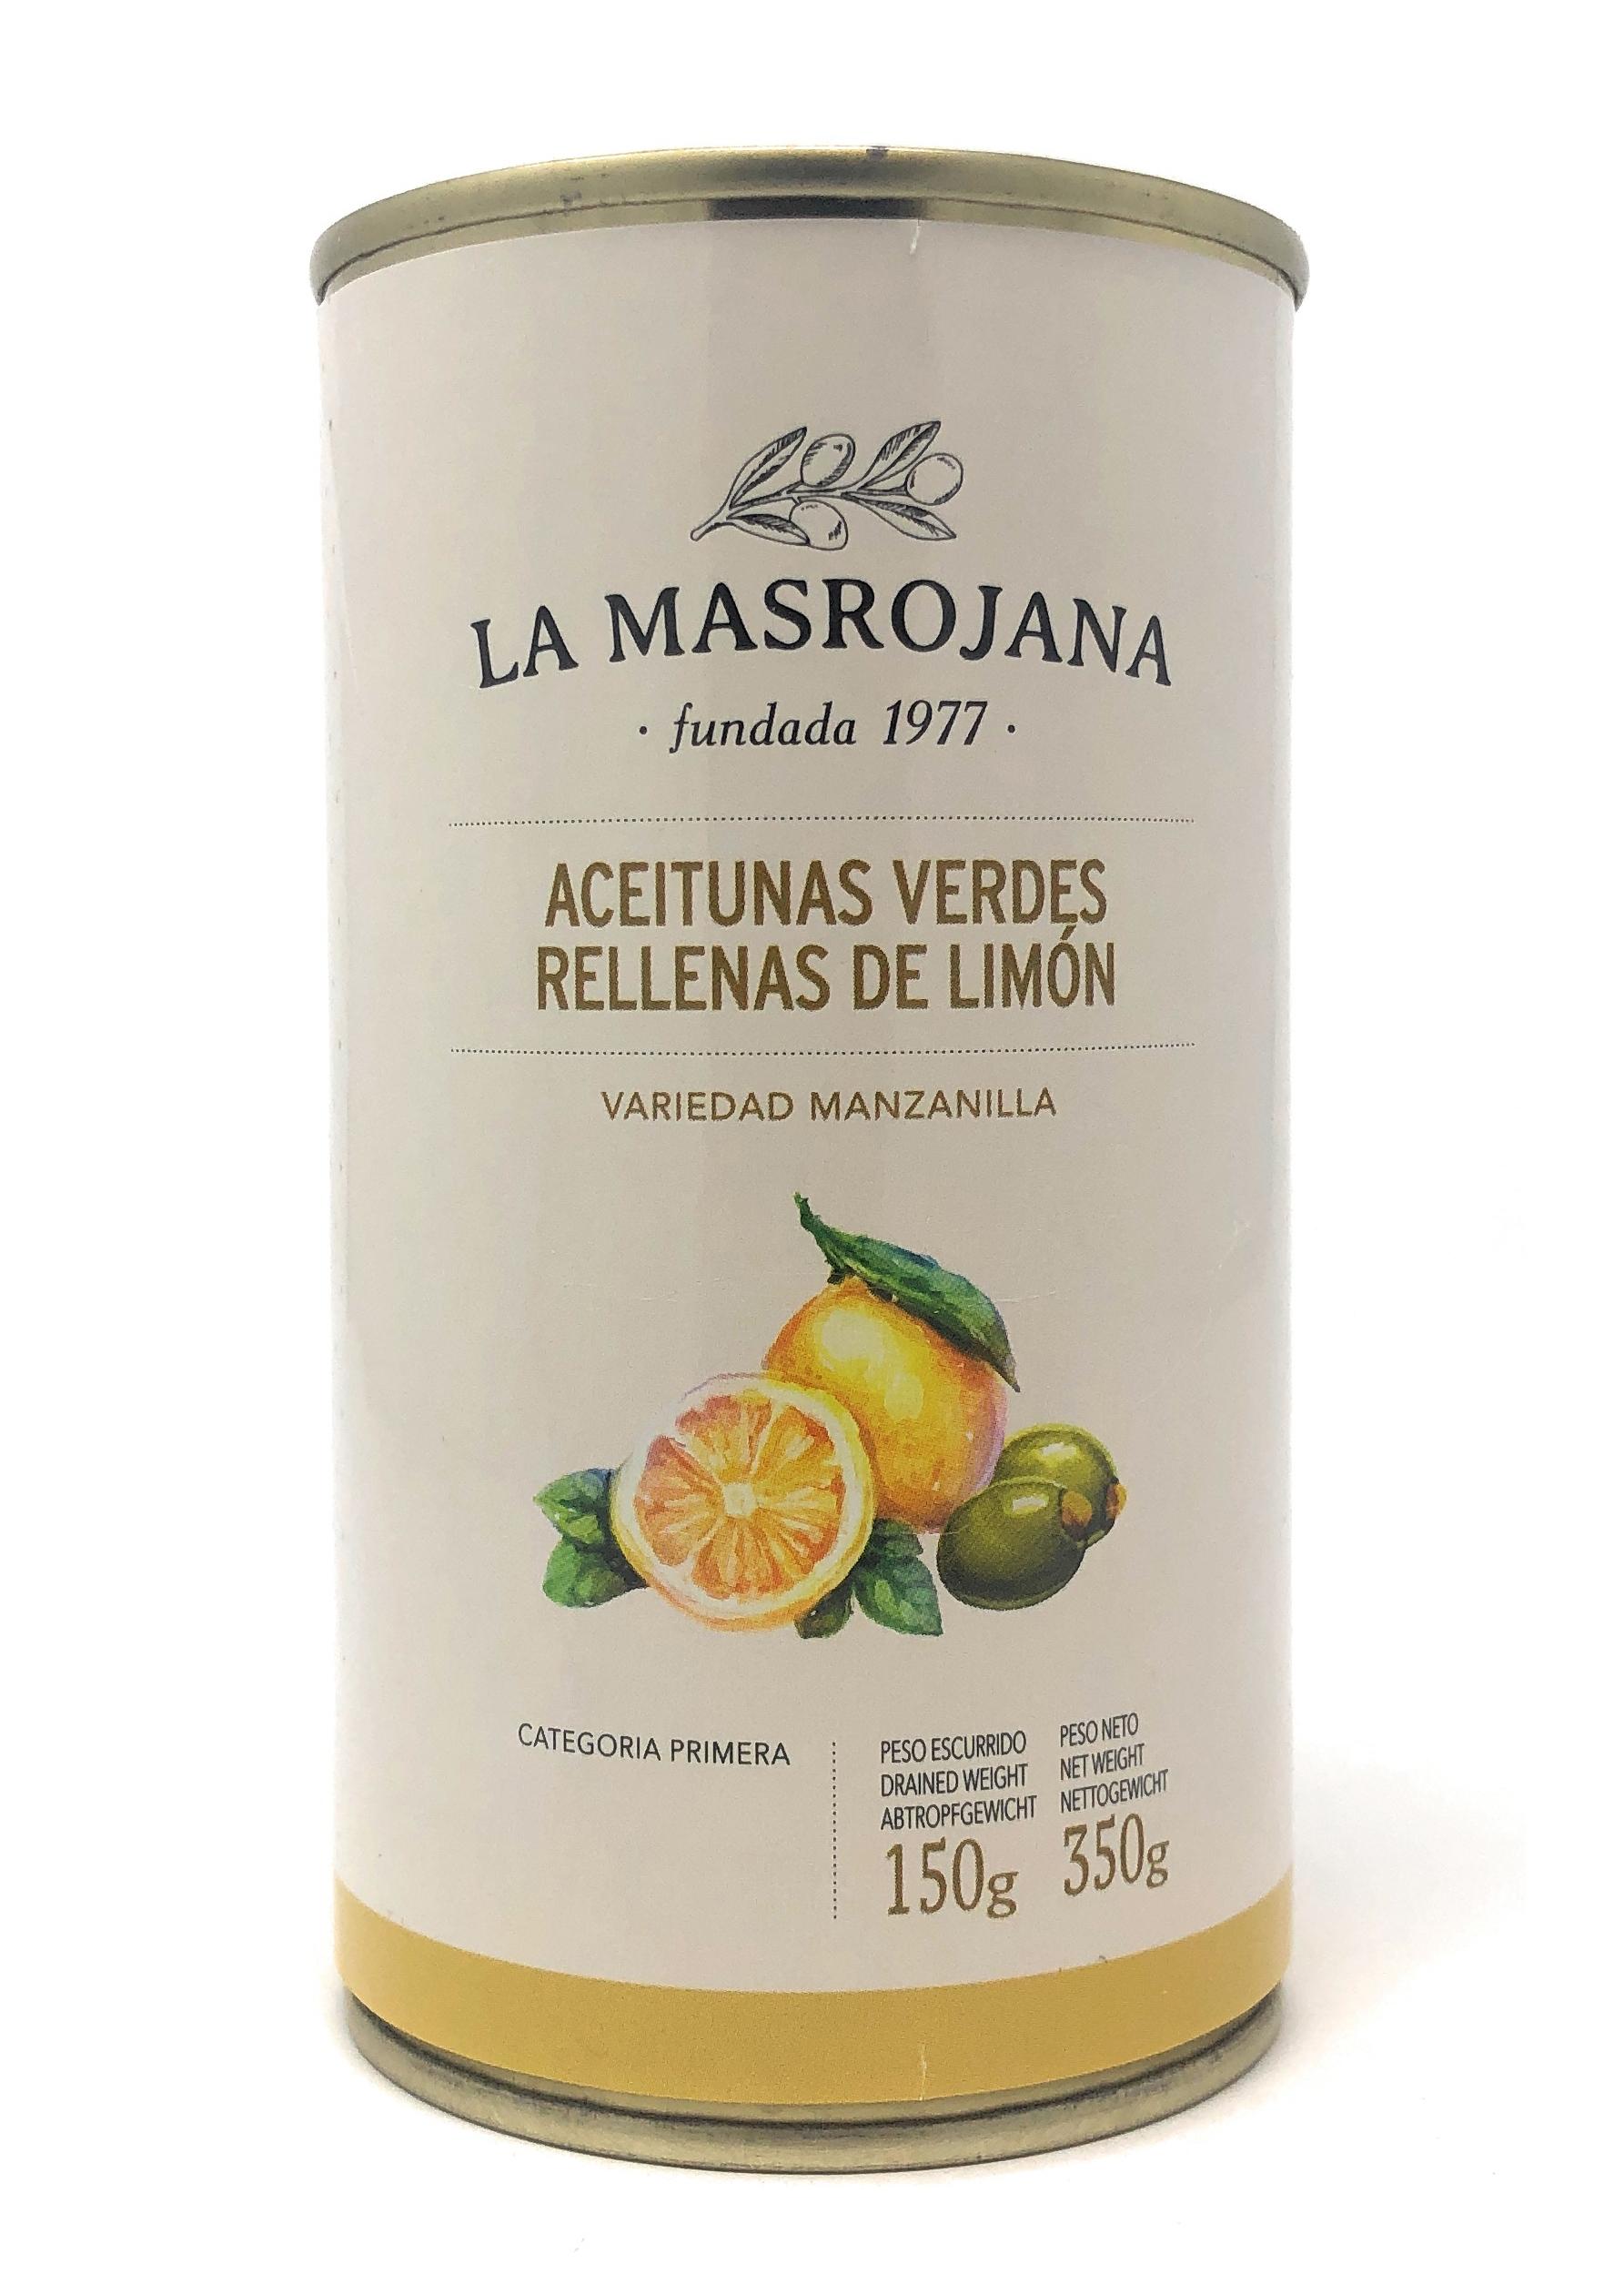 La Masrojana Grüne Manzanilla-Oliven gefüllt mit Zitrone 150g Dose